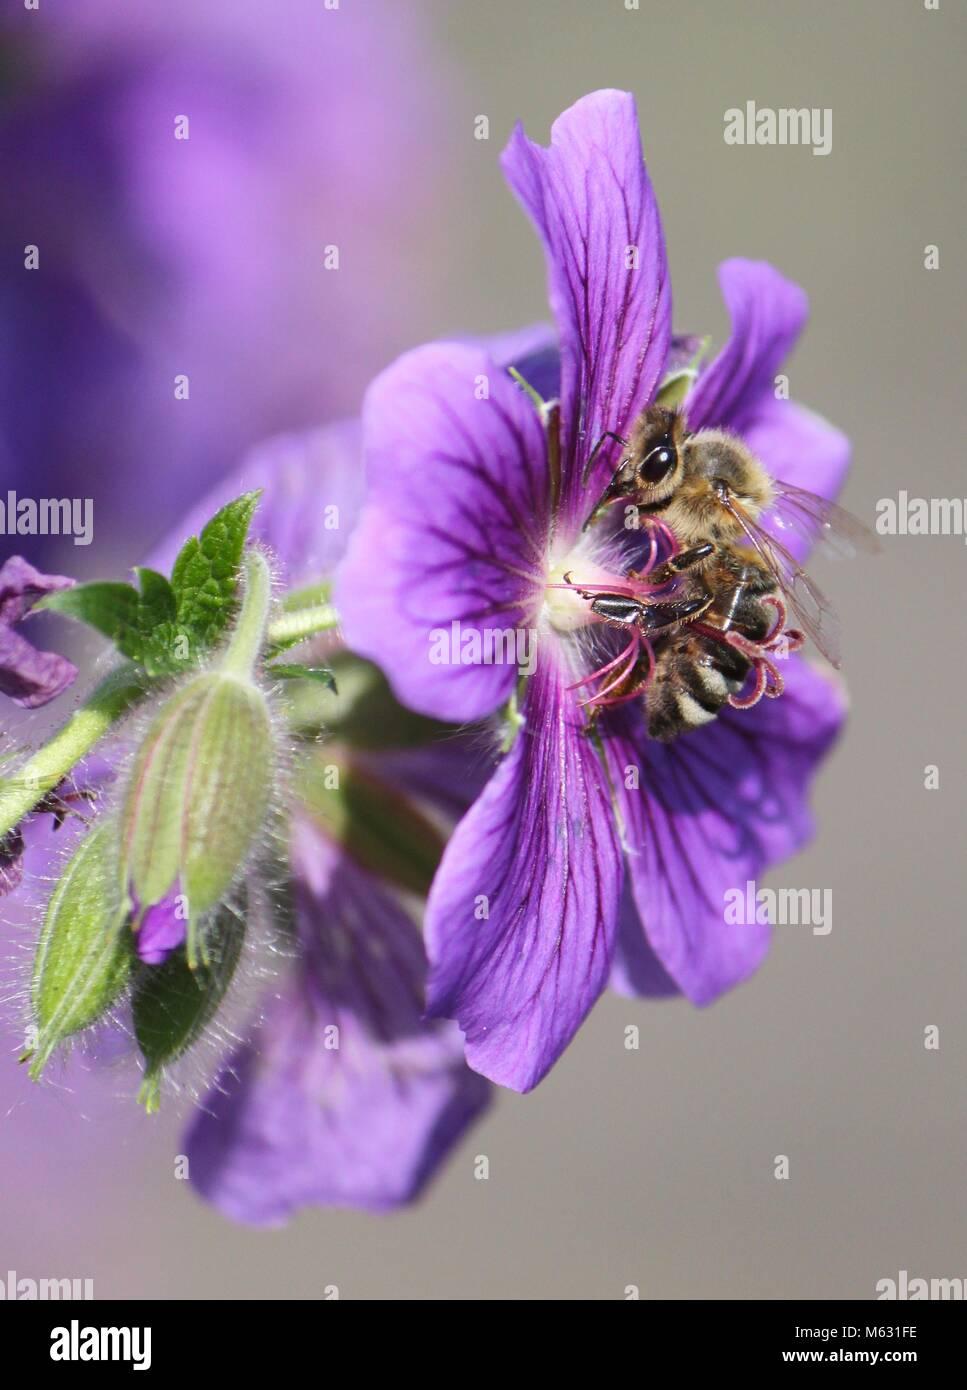 biene an lila blume - Stock Image